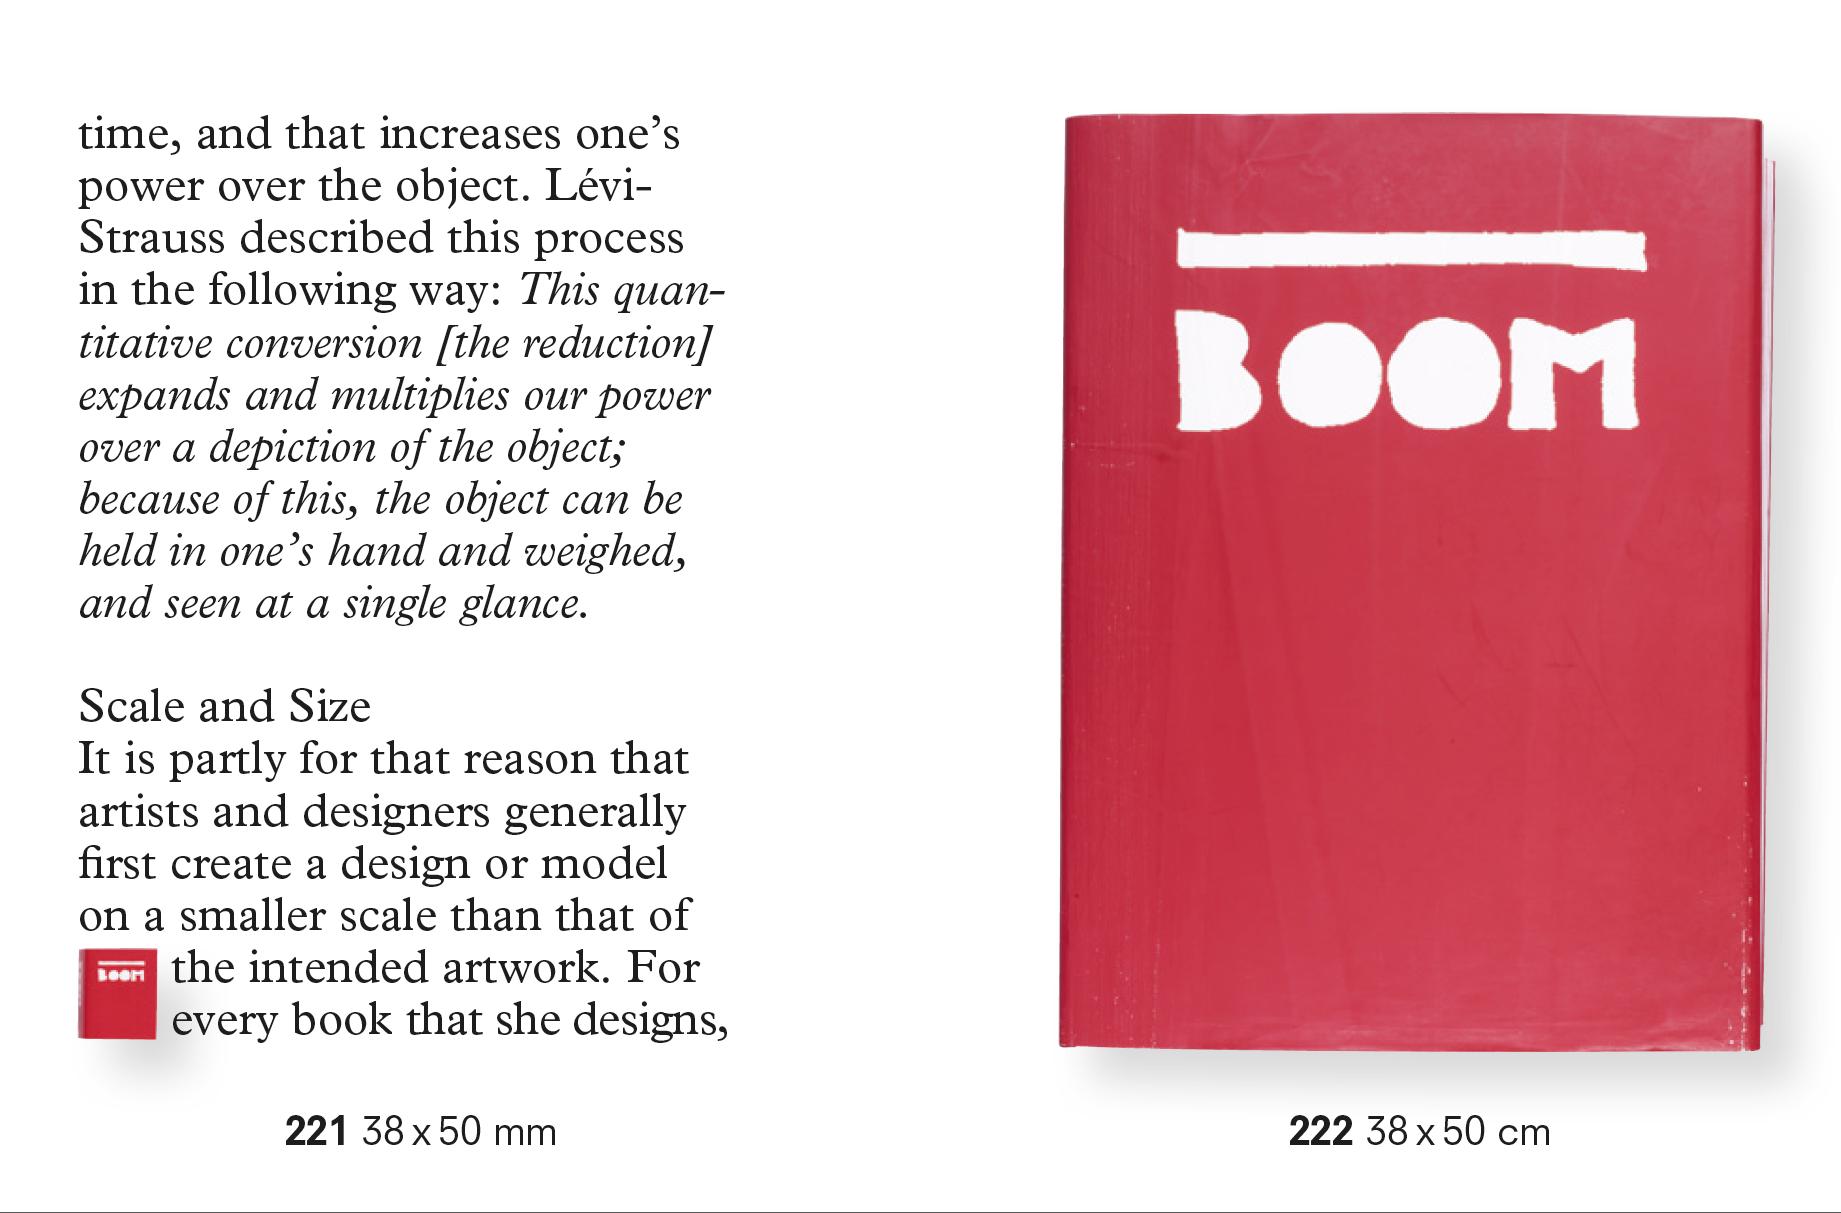 『Irma Boom: Biography』XXLバージョン(2010年)